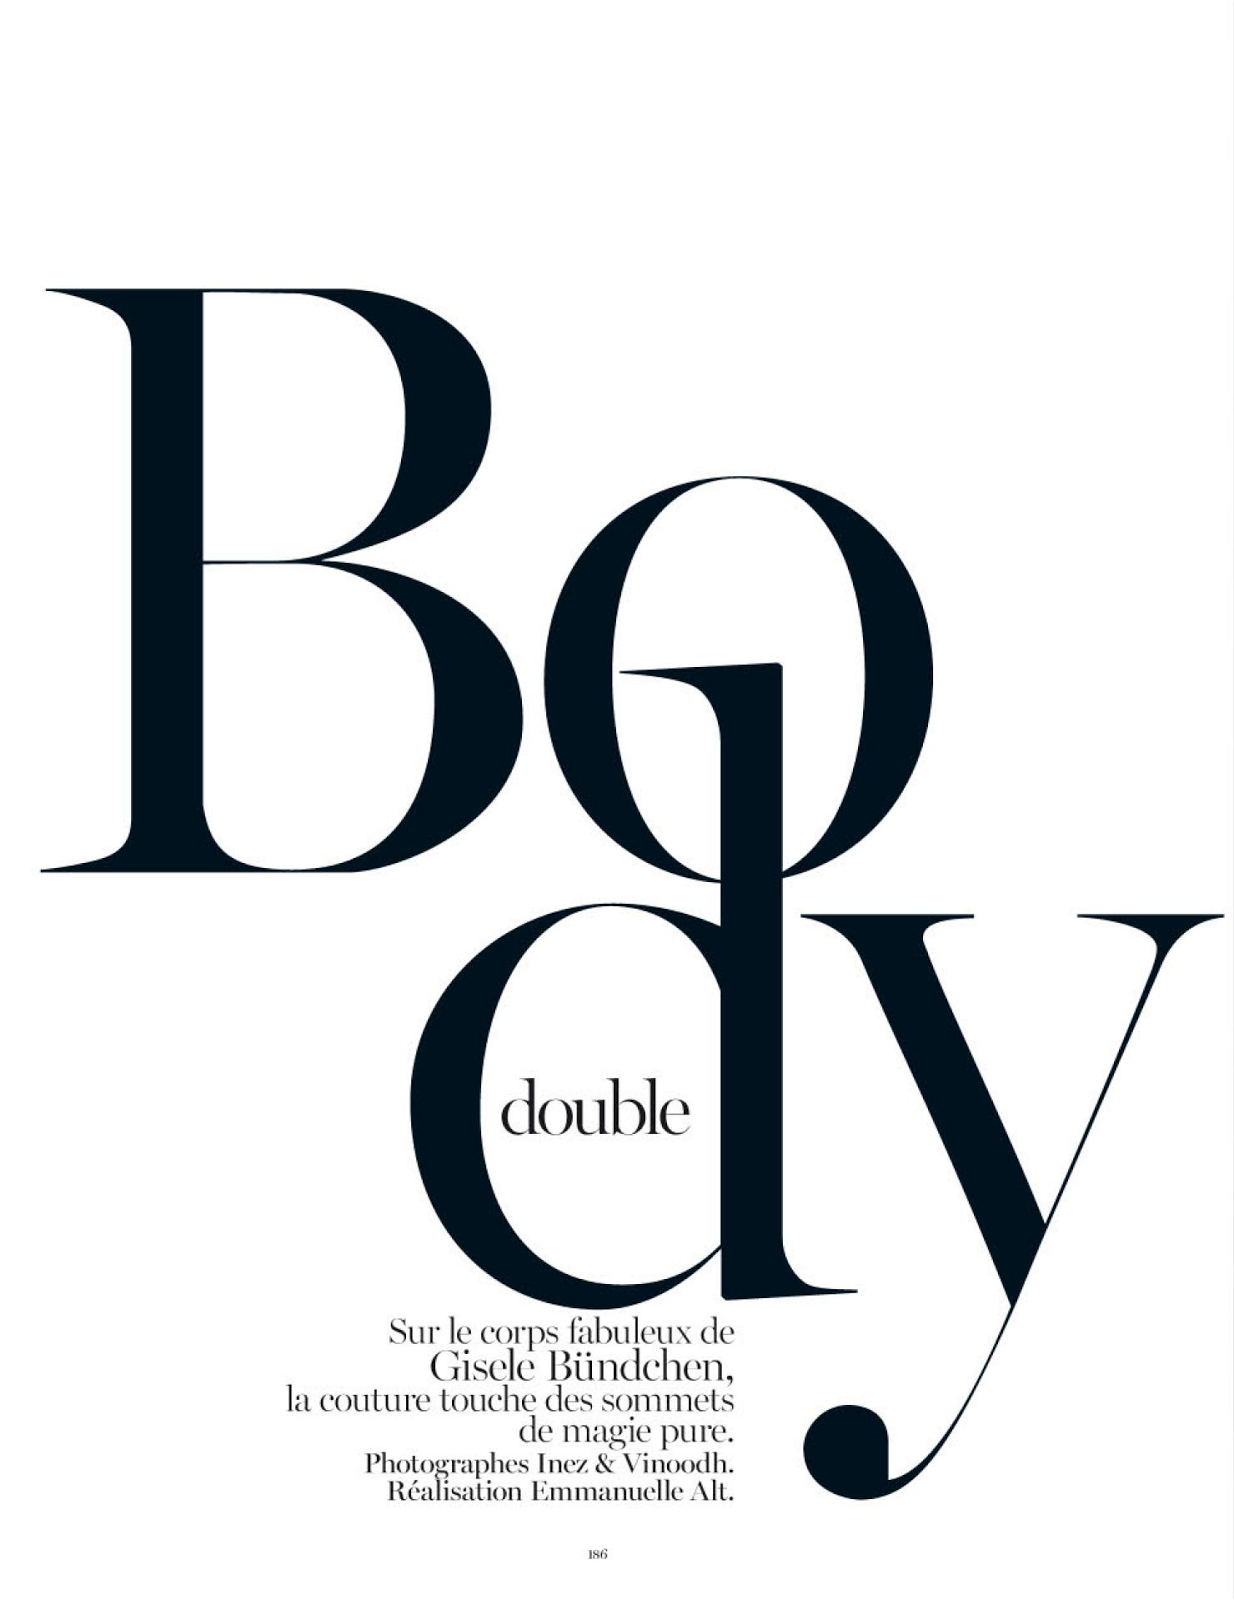 gisele b ndchen in body double by inez vinoodh for vogue paris rh pinterest com Vogue Logo Tumblr vogue eyewear logo font